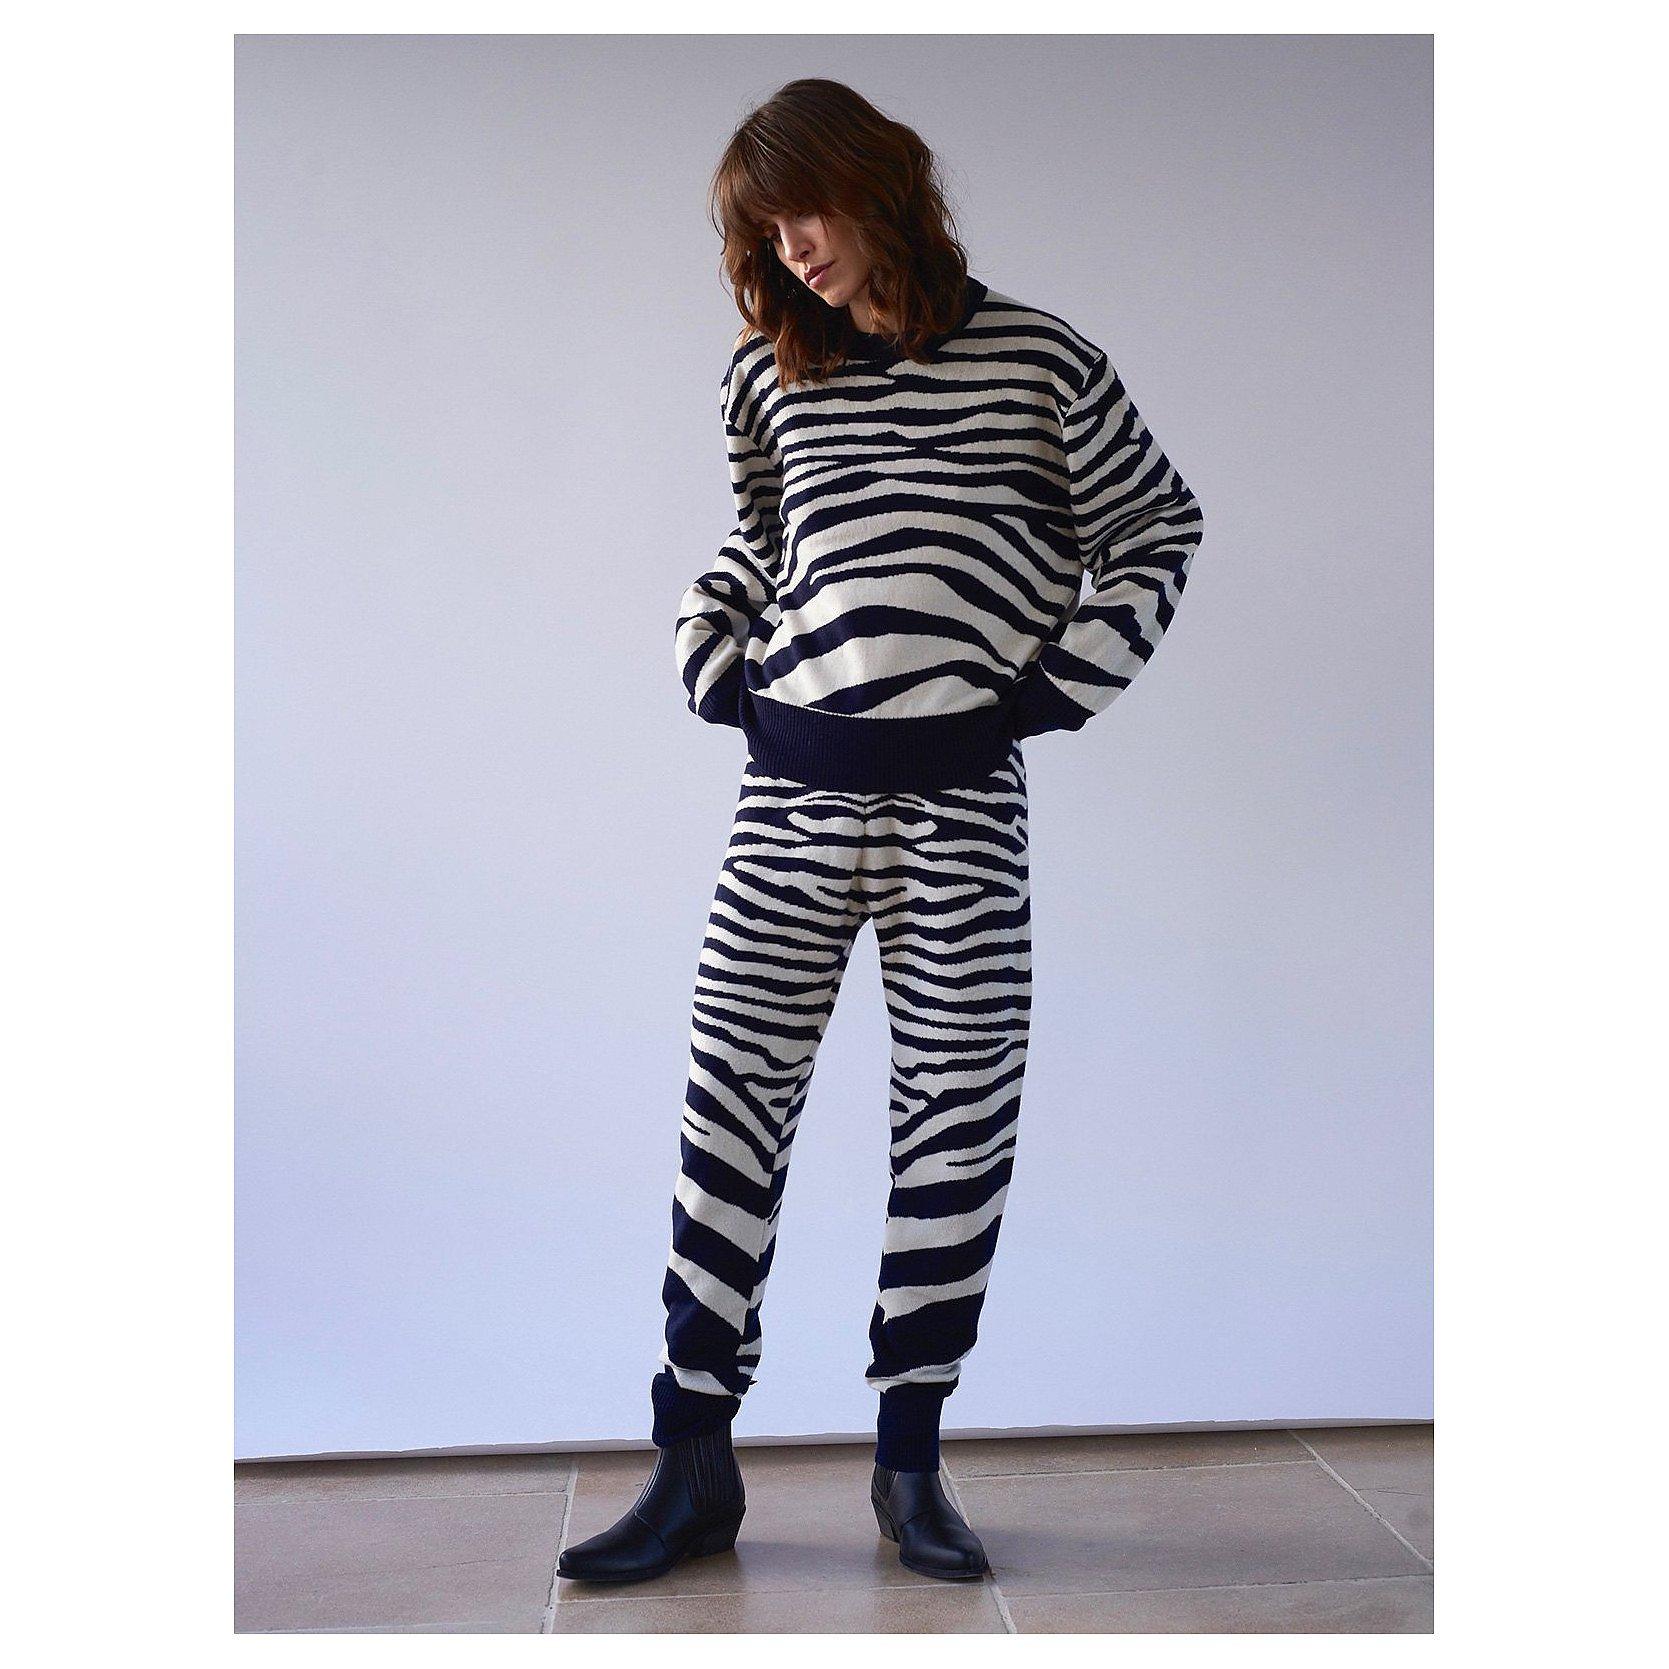 Sykes London Phoebe Zebra Sweater